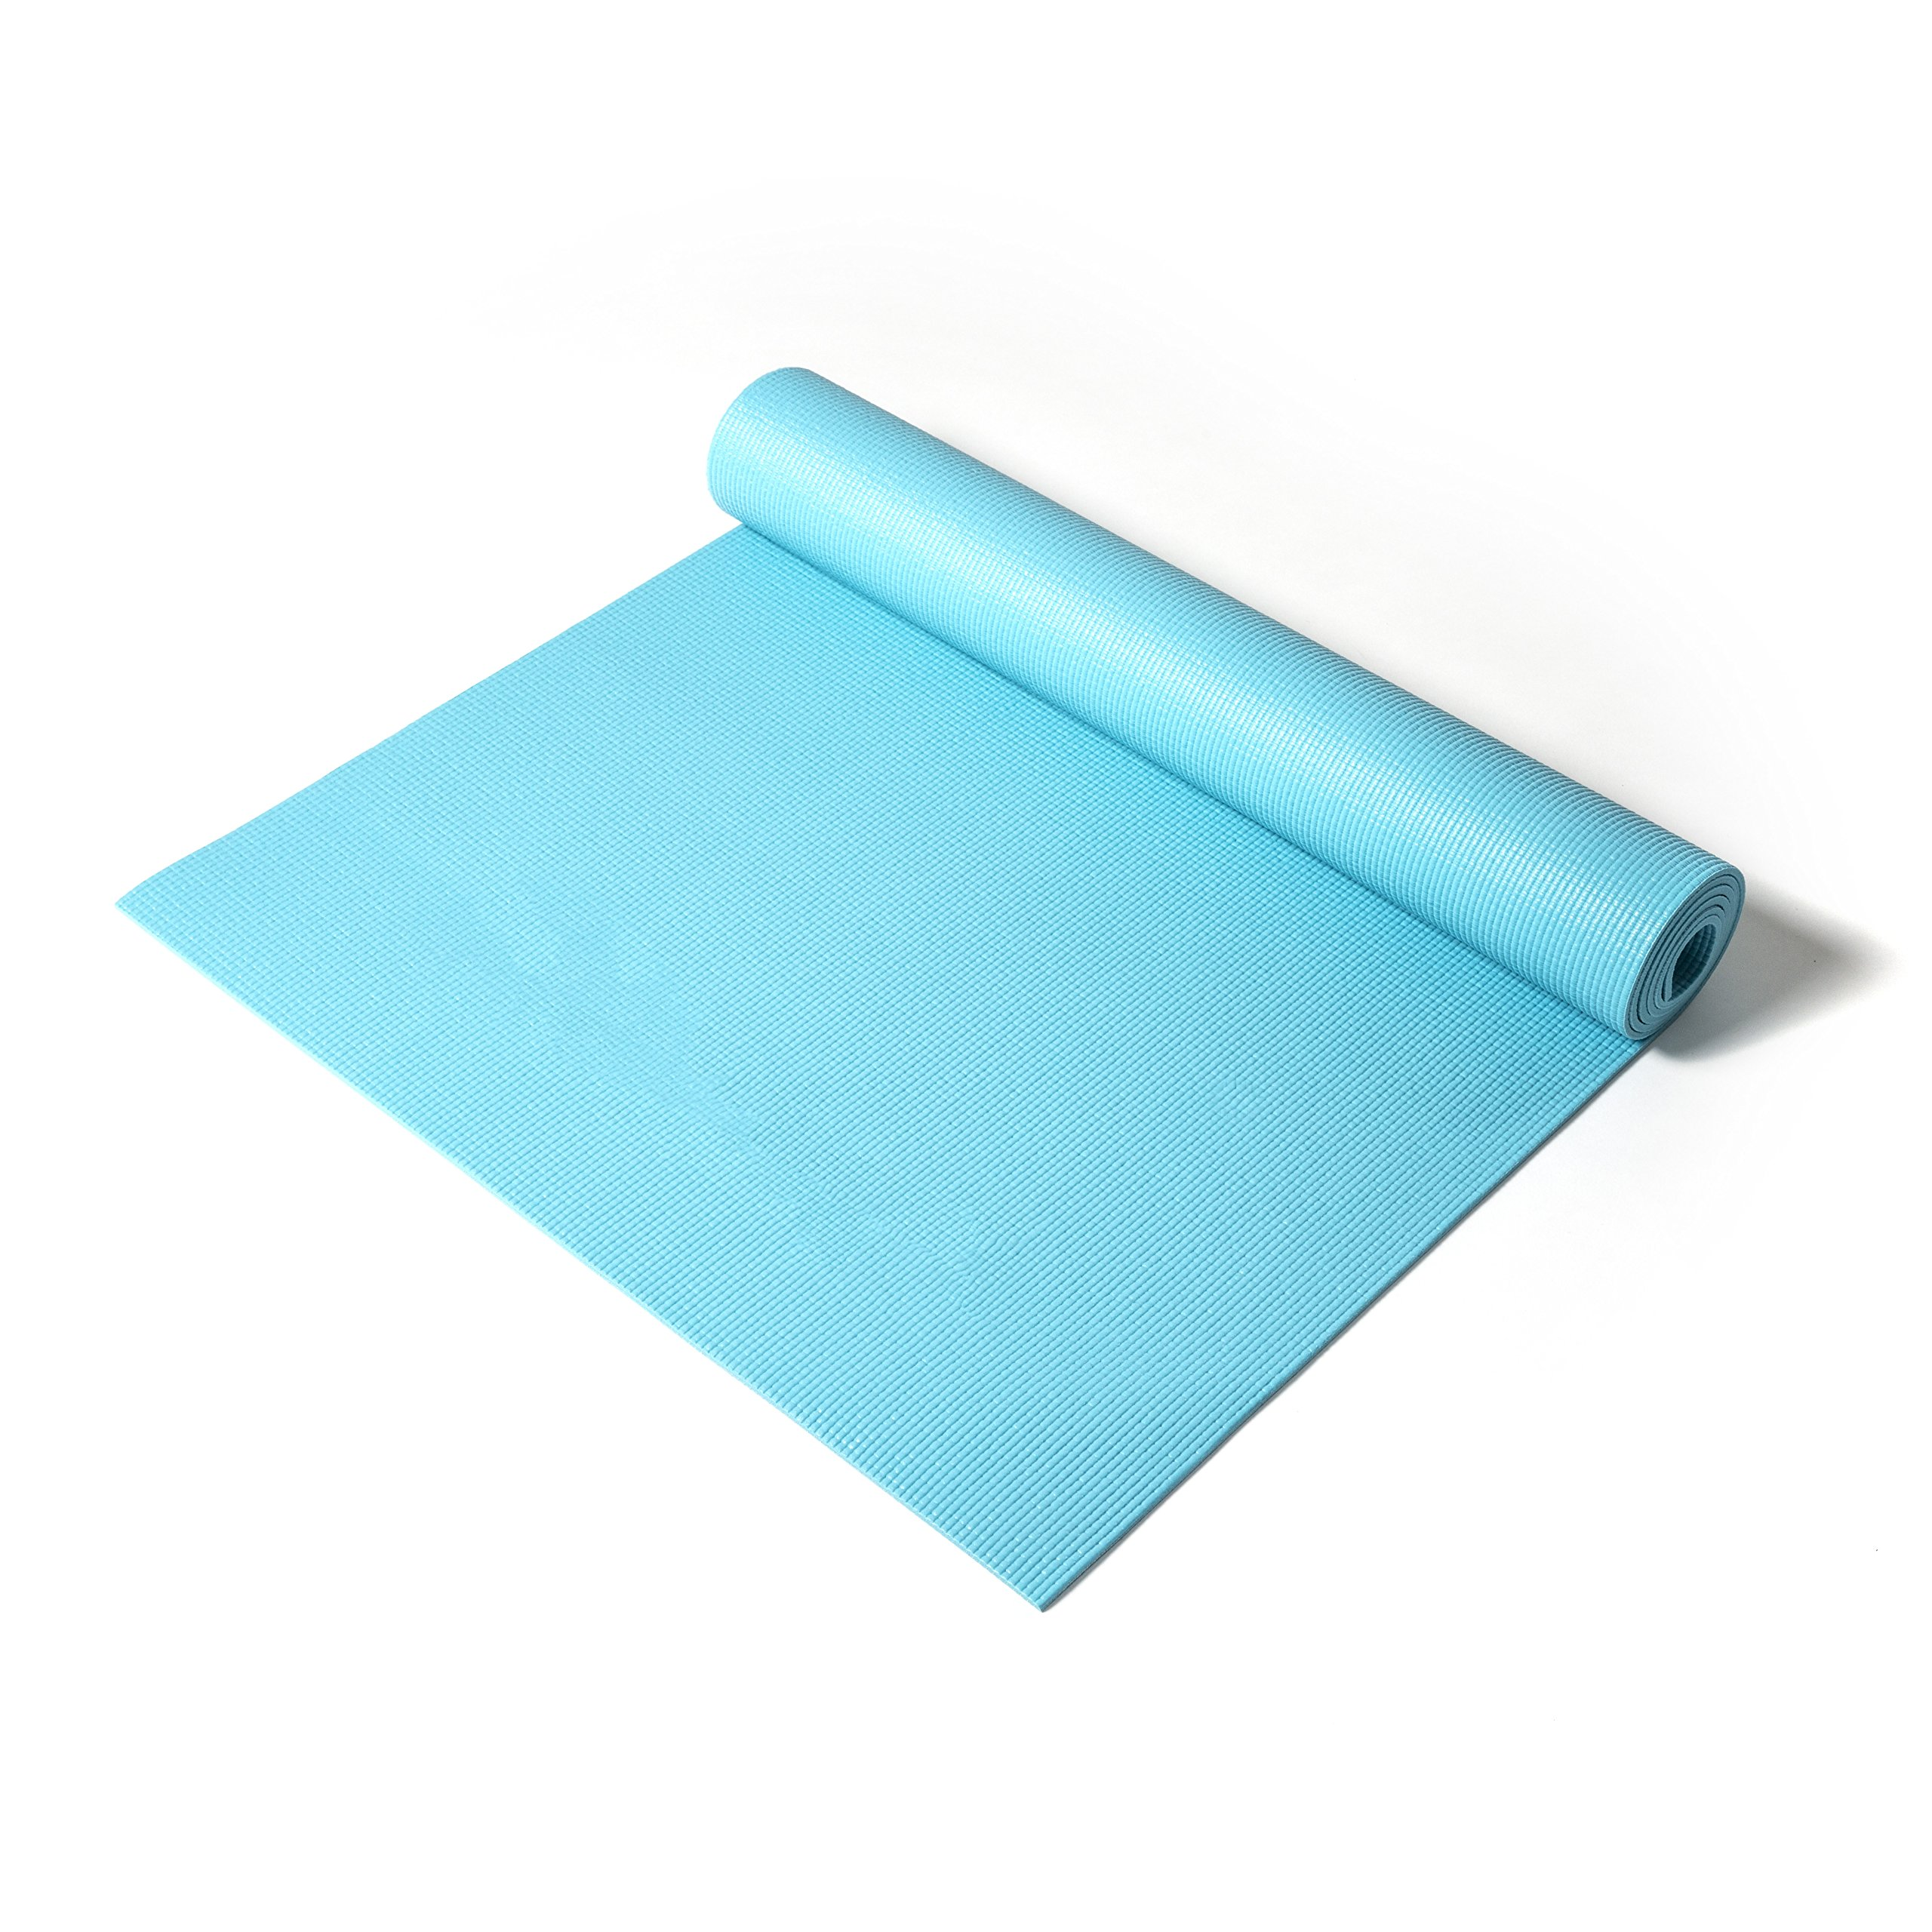 Reebok fitness , training equipment, Yoga mat (color: Blue) [RAMT-11024BLL] by Reebok (Image #2)